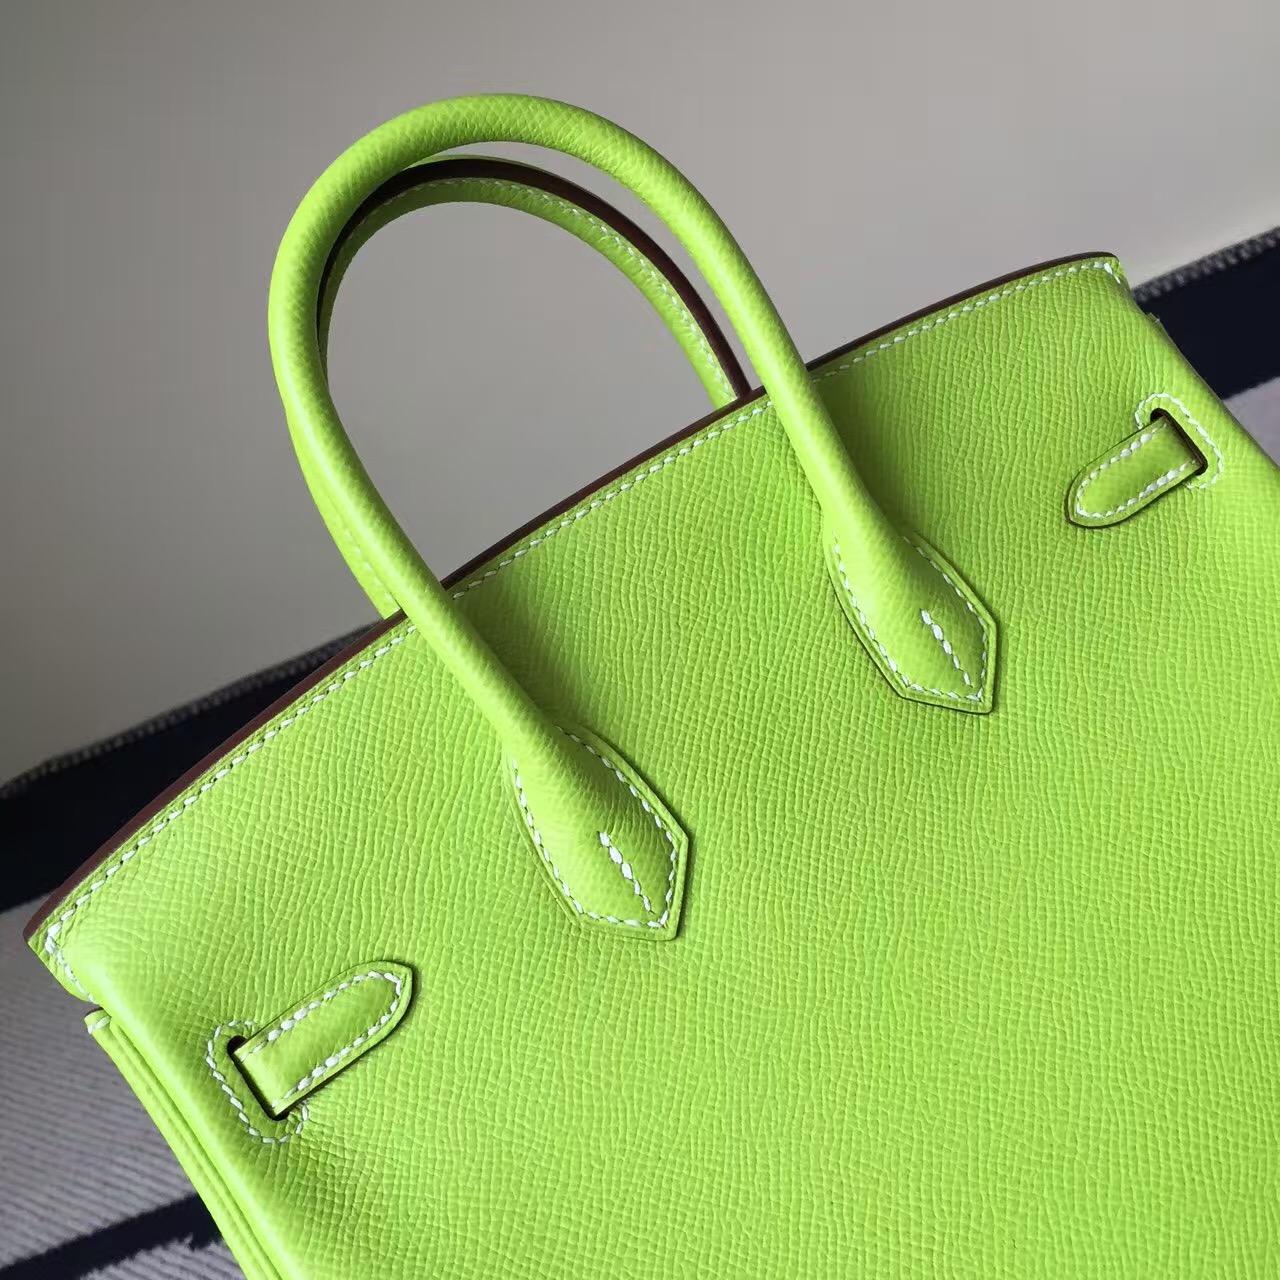 Hand Stitching Hermes Epsom Leather Birkin Bag 25cm in 6R Kiwi Green